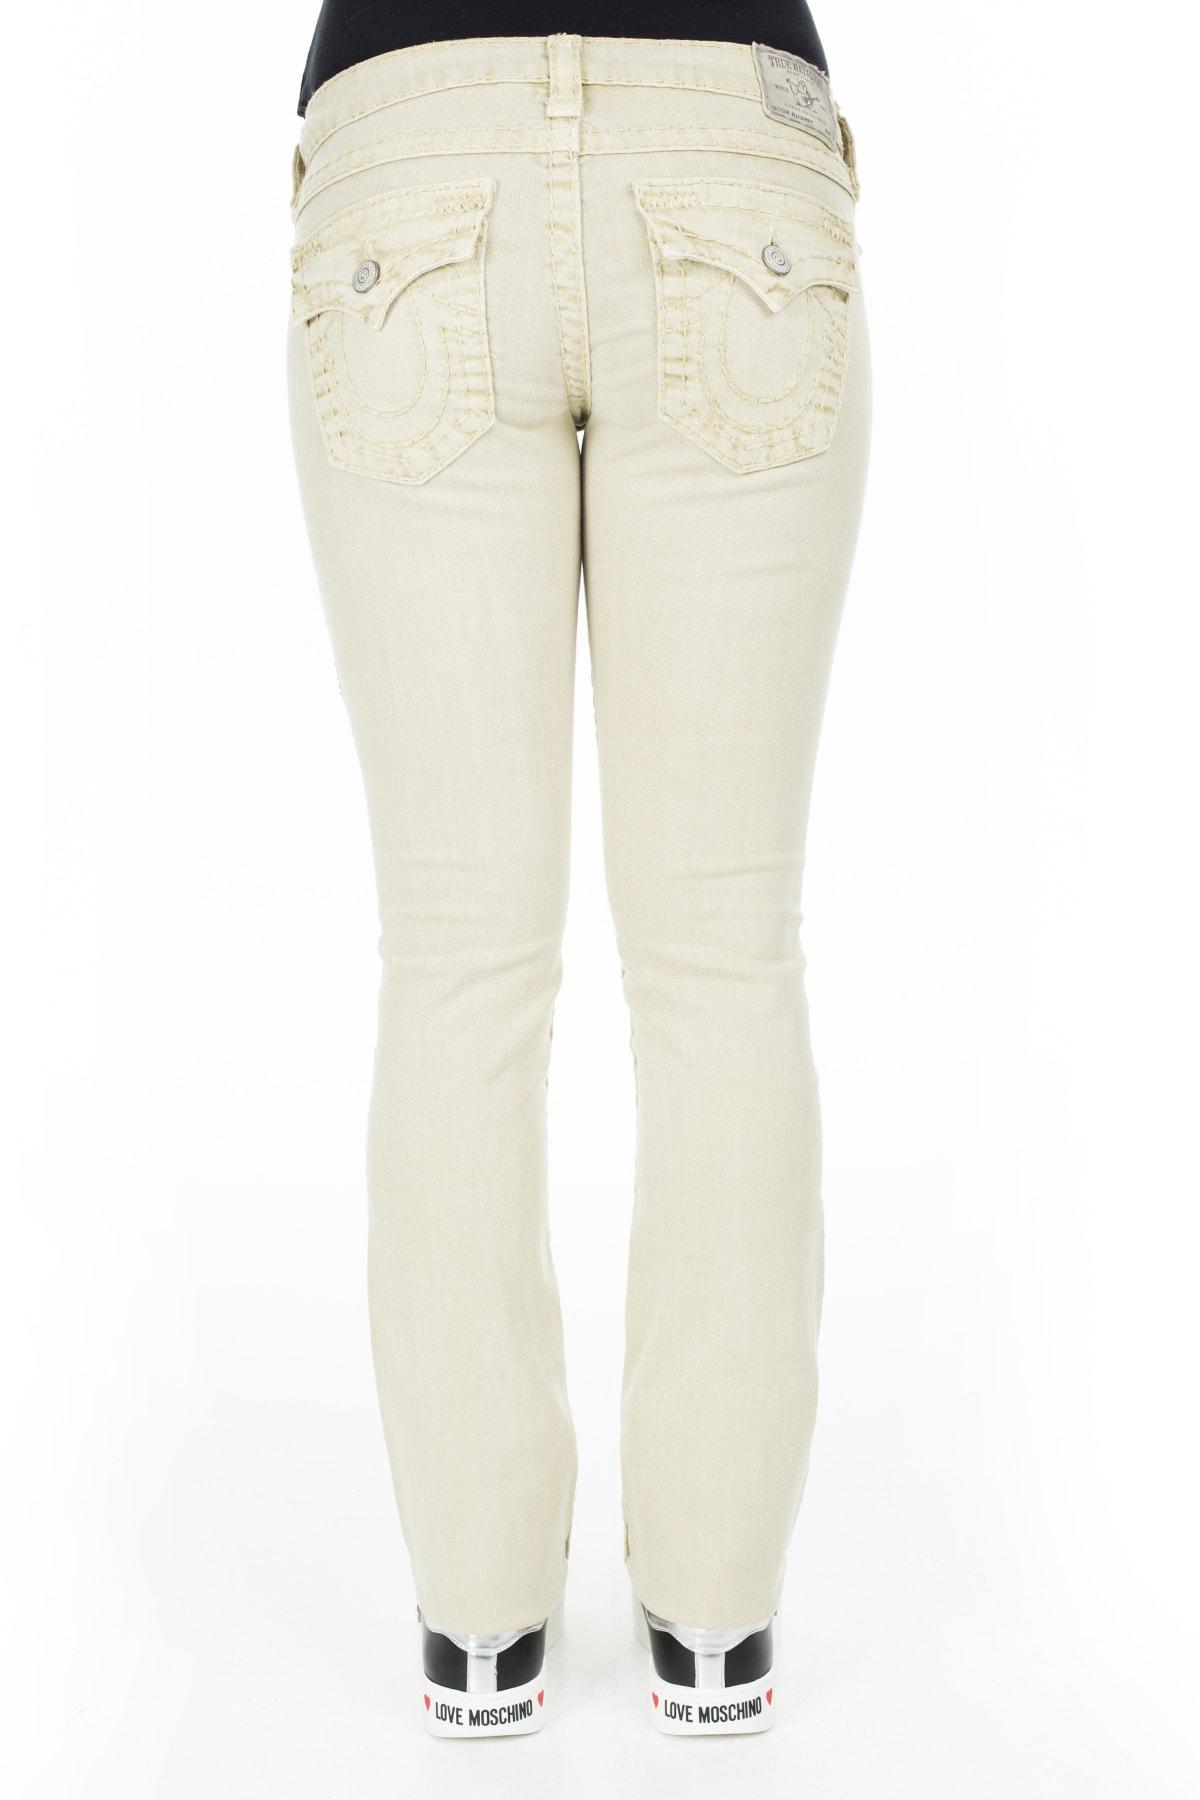 True Religion Jeans Kadın Kot Pantolon W95572N99 3